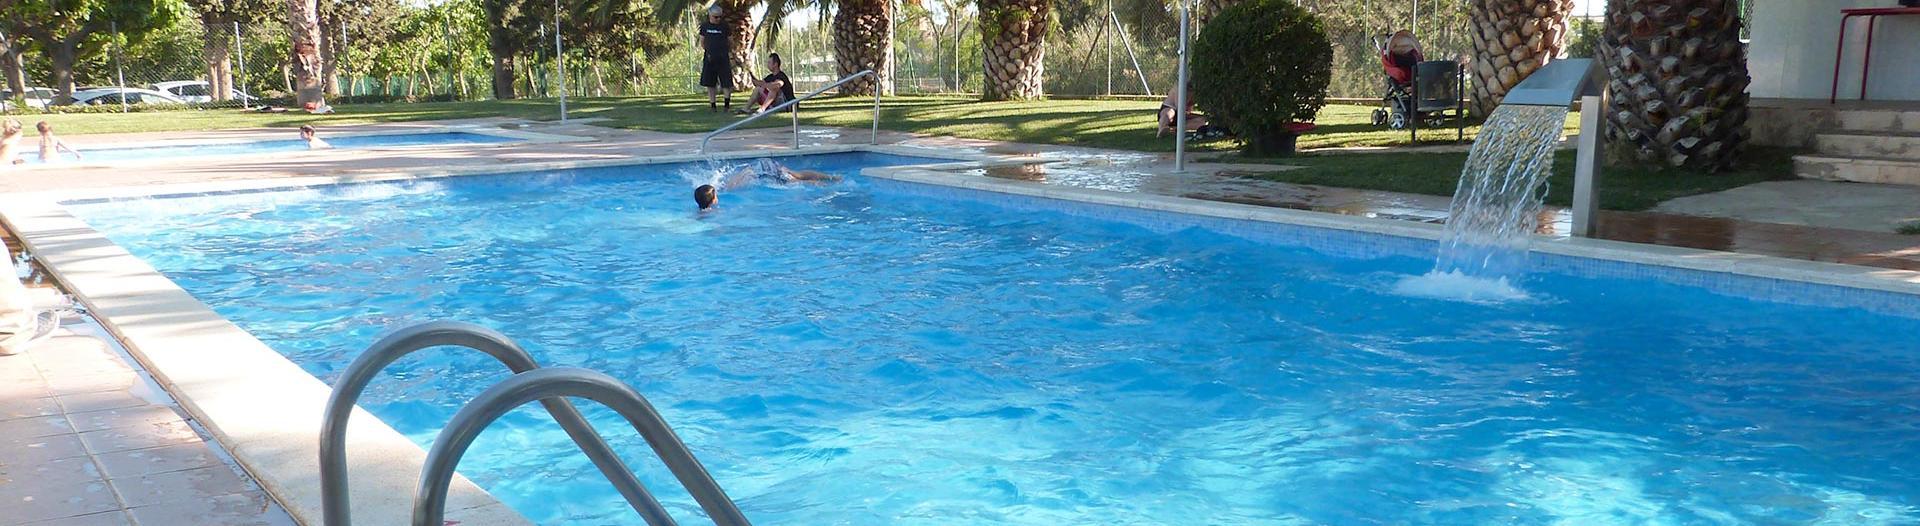 slider-camping-amfora-darcs-piscines